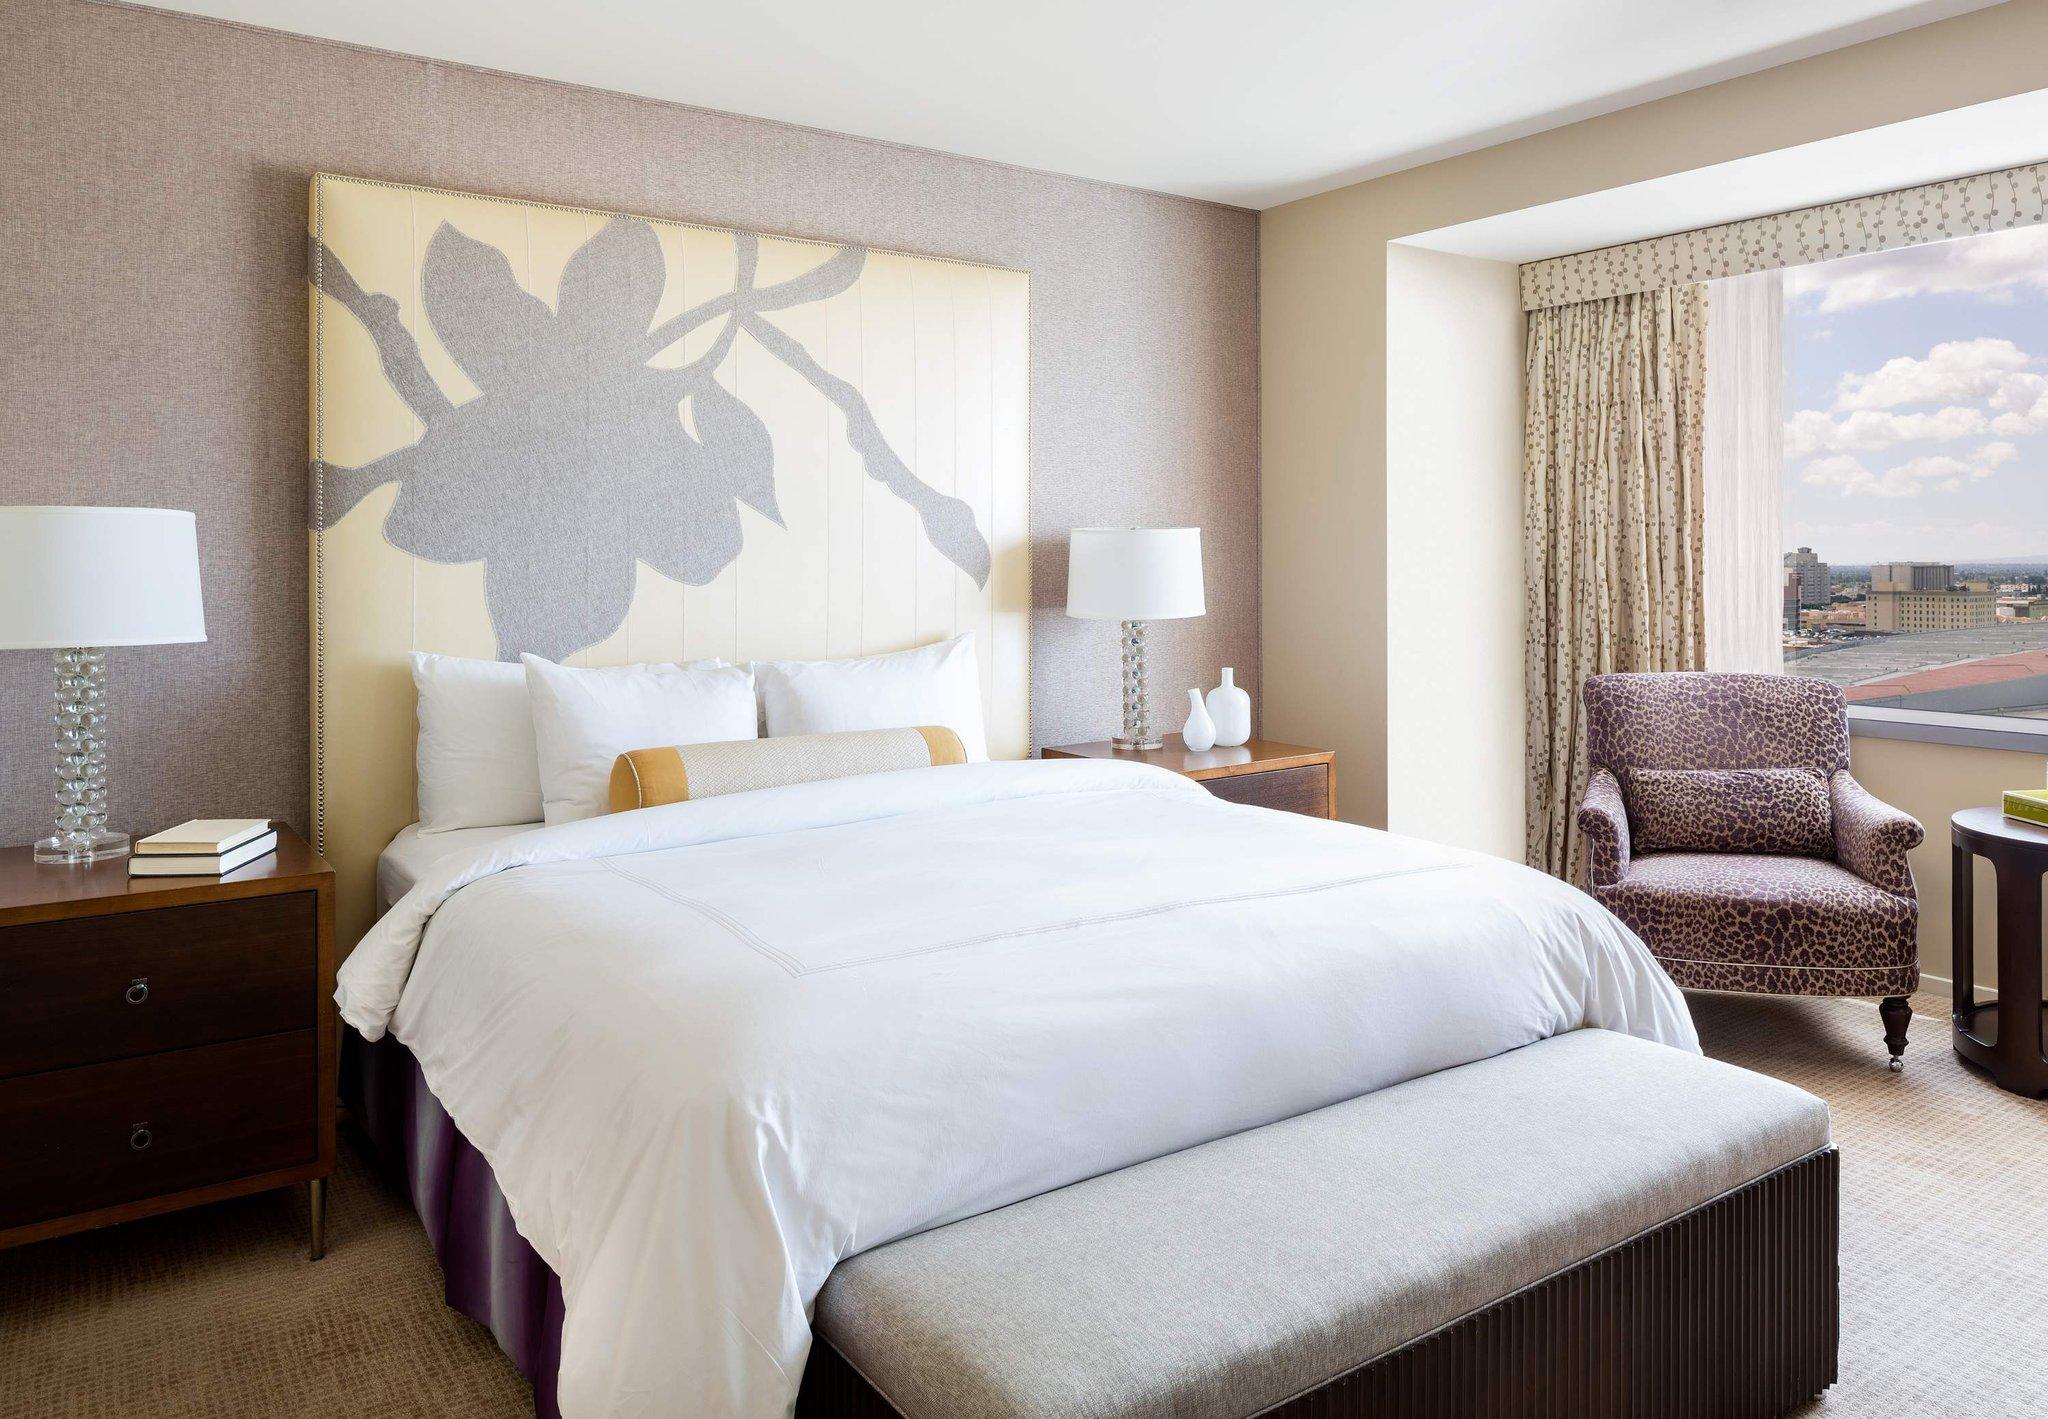 Article 112150 purple bedroom colors - Article 112150 Purple Bedroom Colors 42